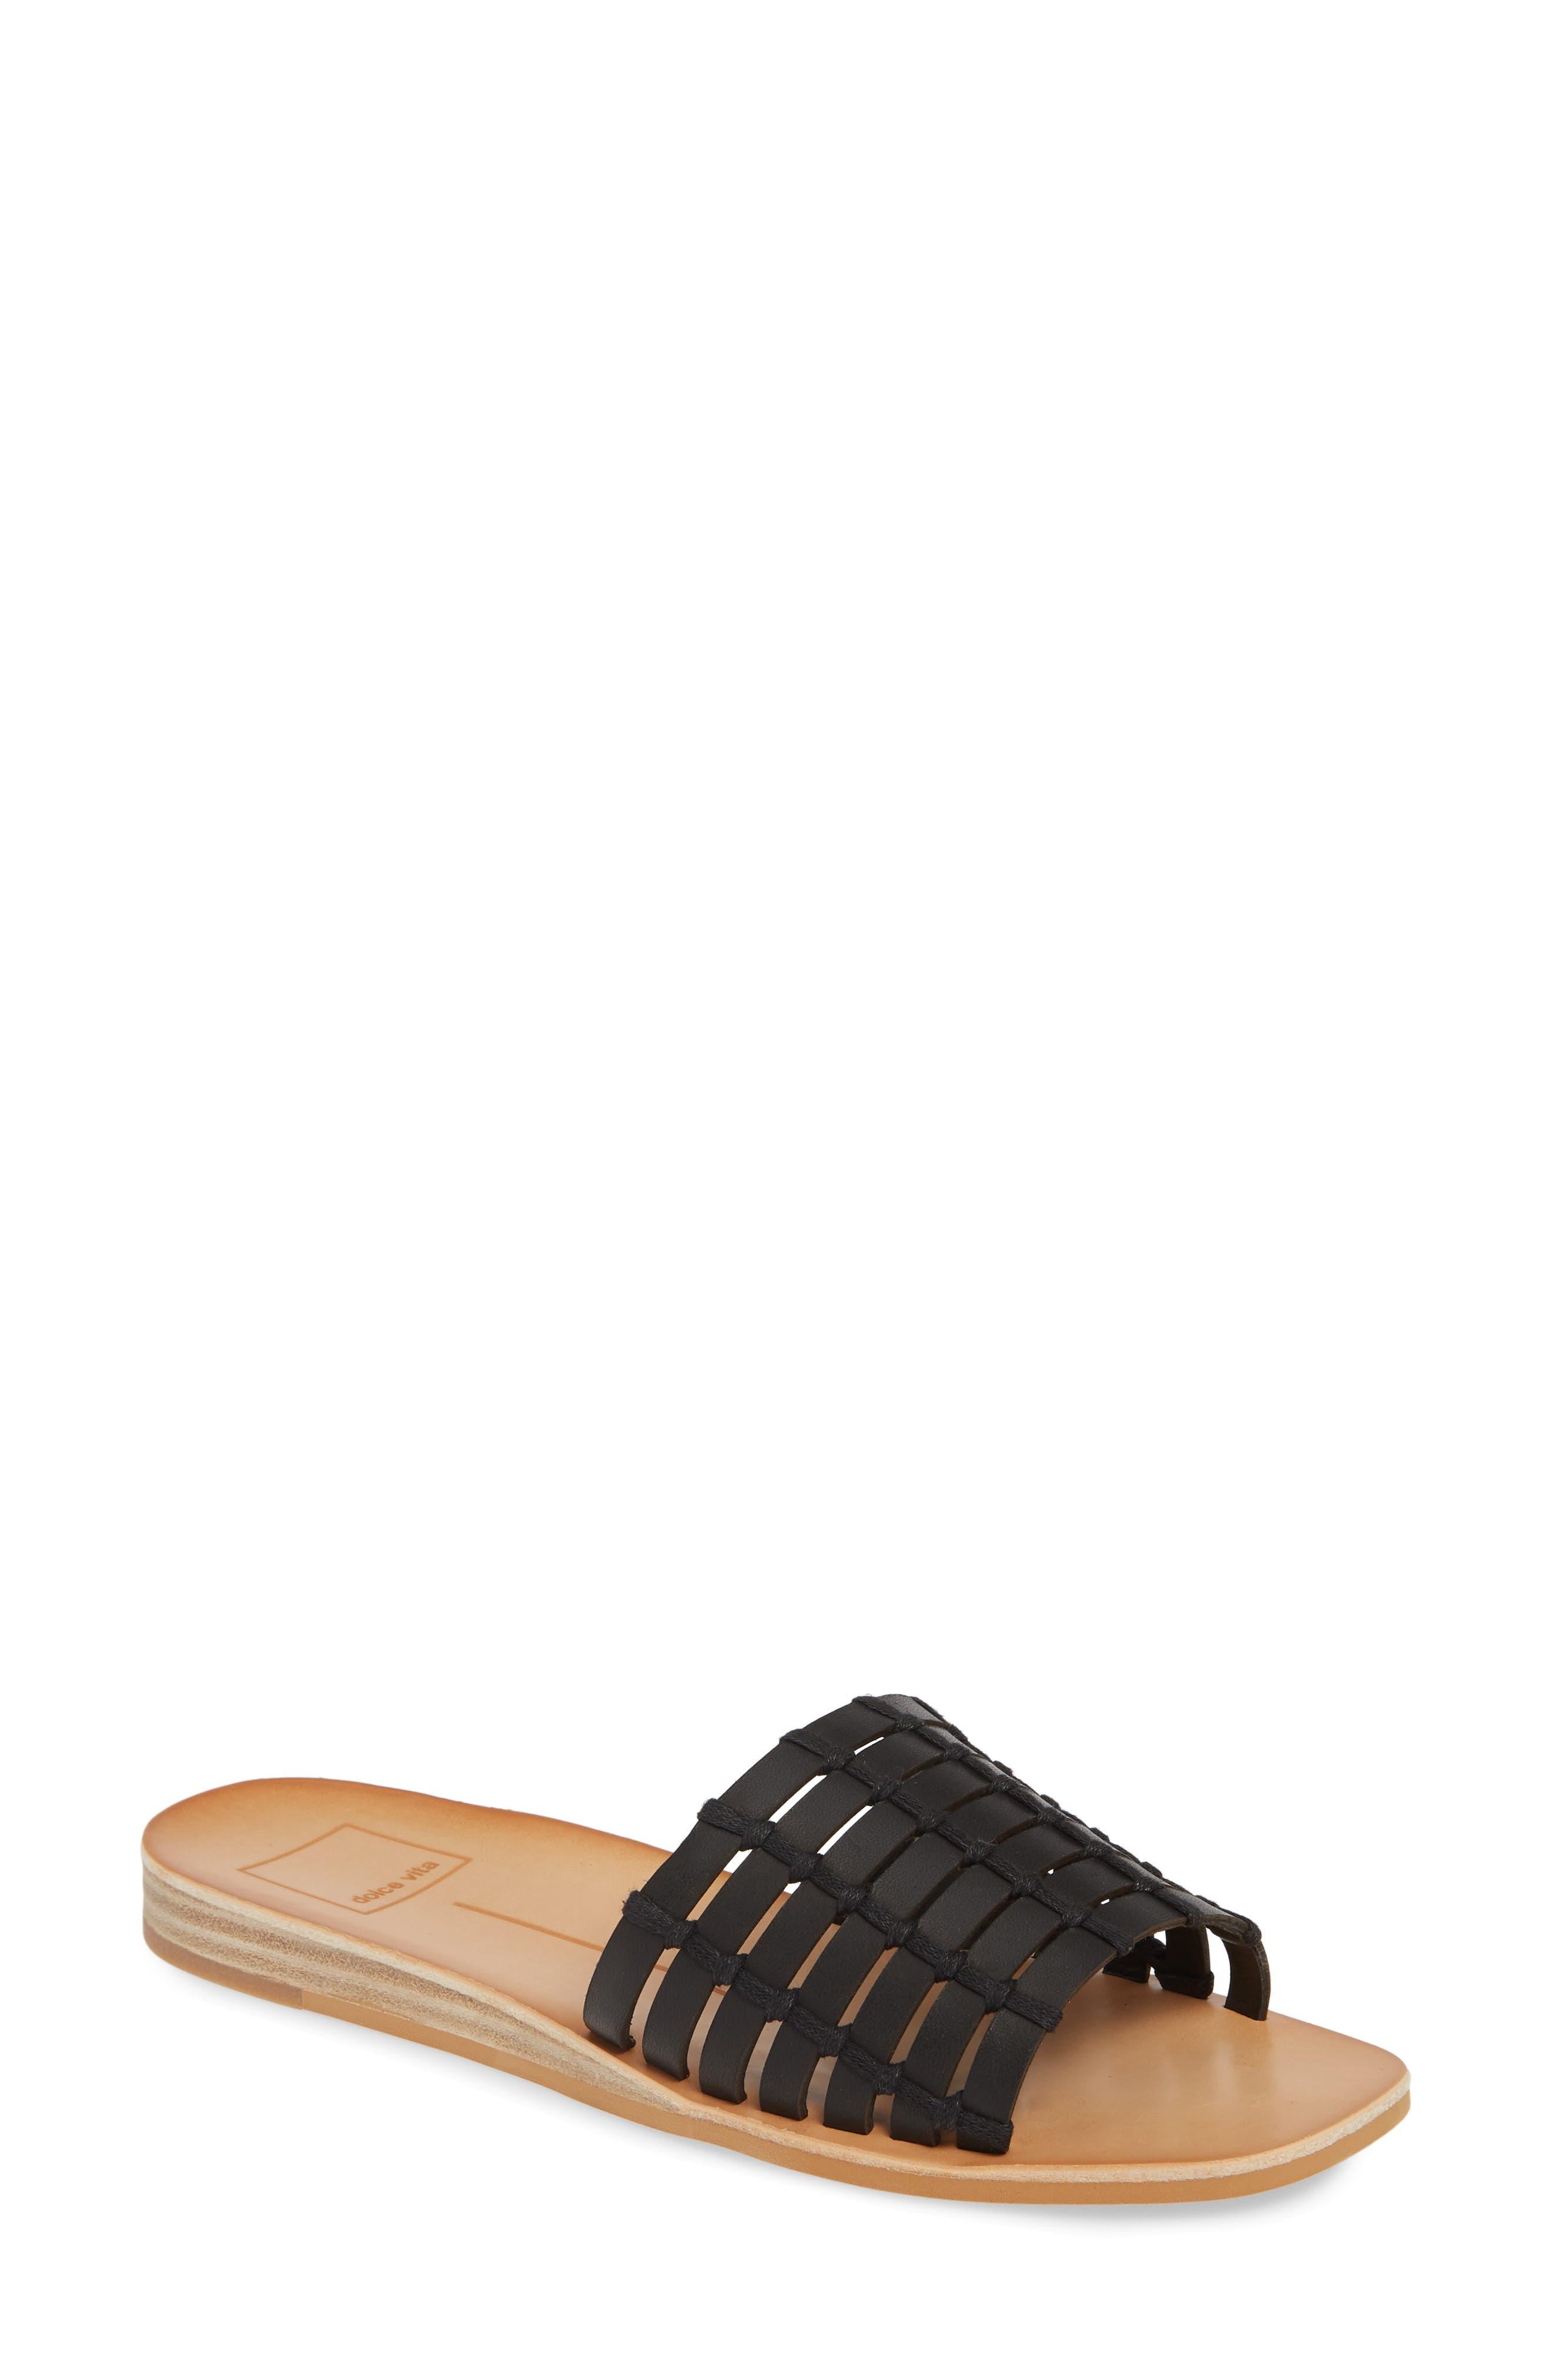 DOLCE VITA, Colsen Slide Sandal, Main thumbnail 1, color, BLACK LEATHER